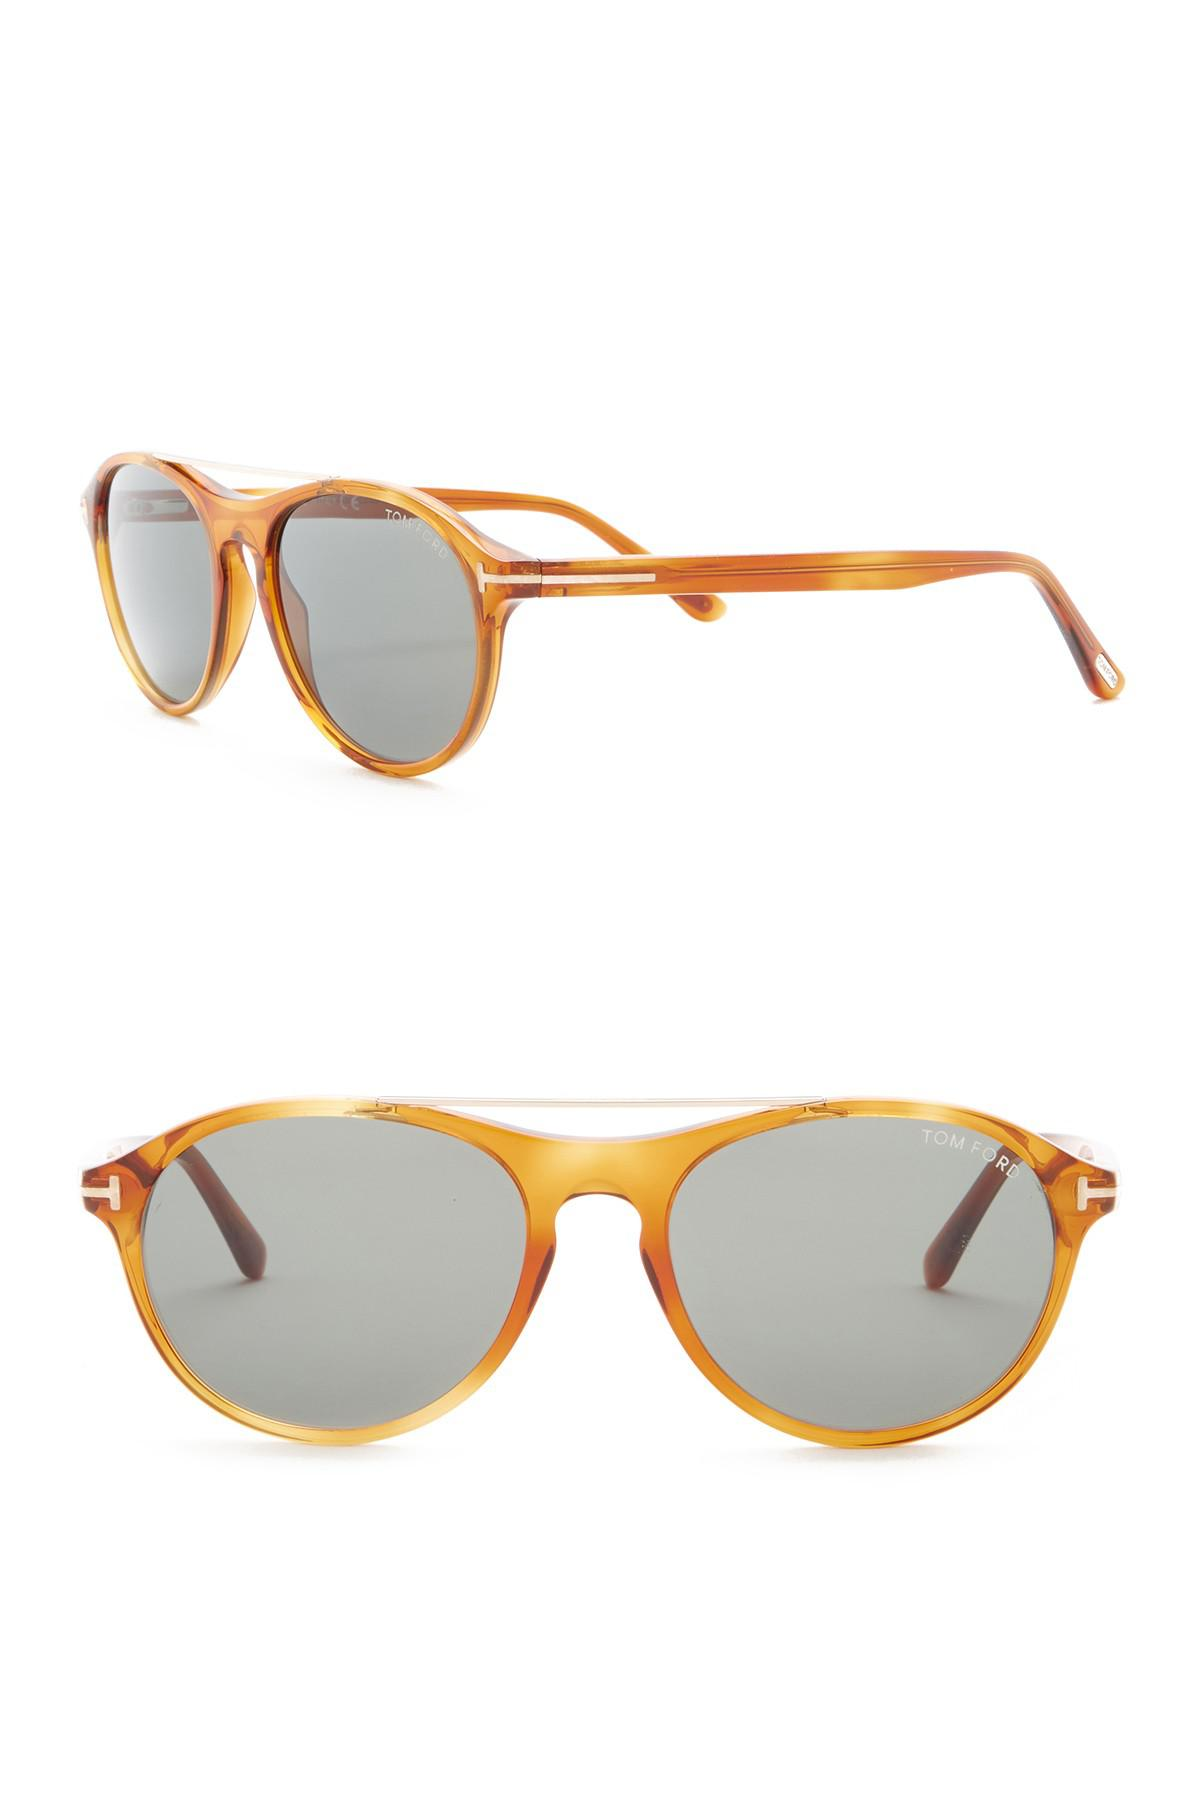 5db5266ecaf Lyst - Tom Ford Cameron 53mm Round Sunglasses for Men